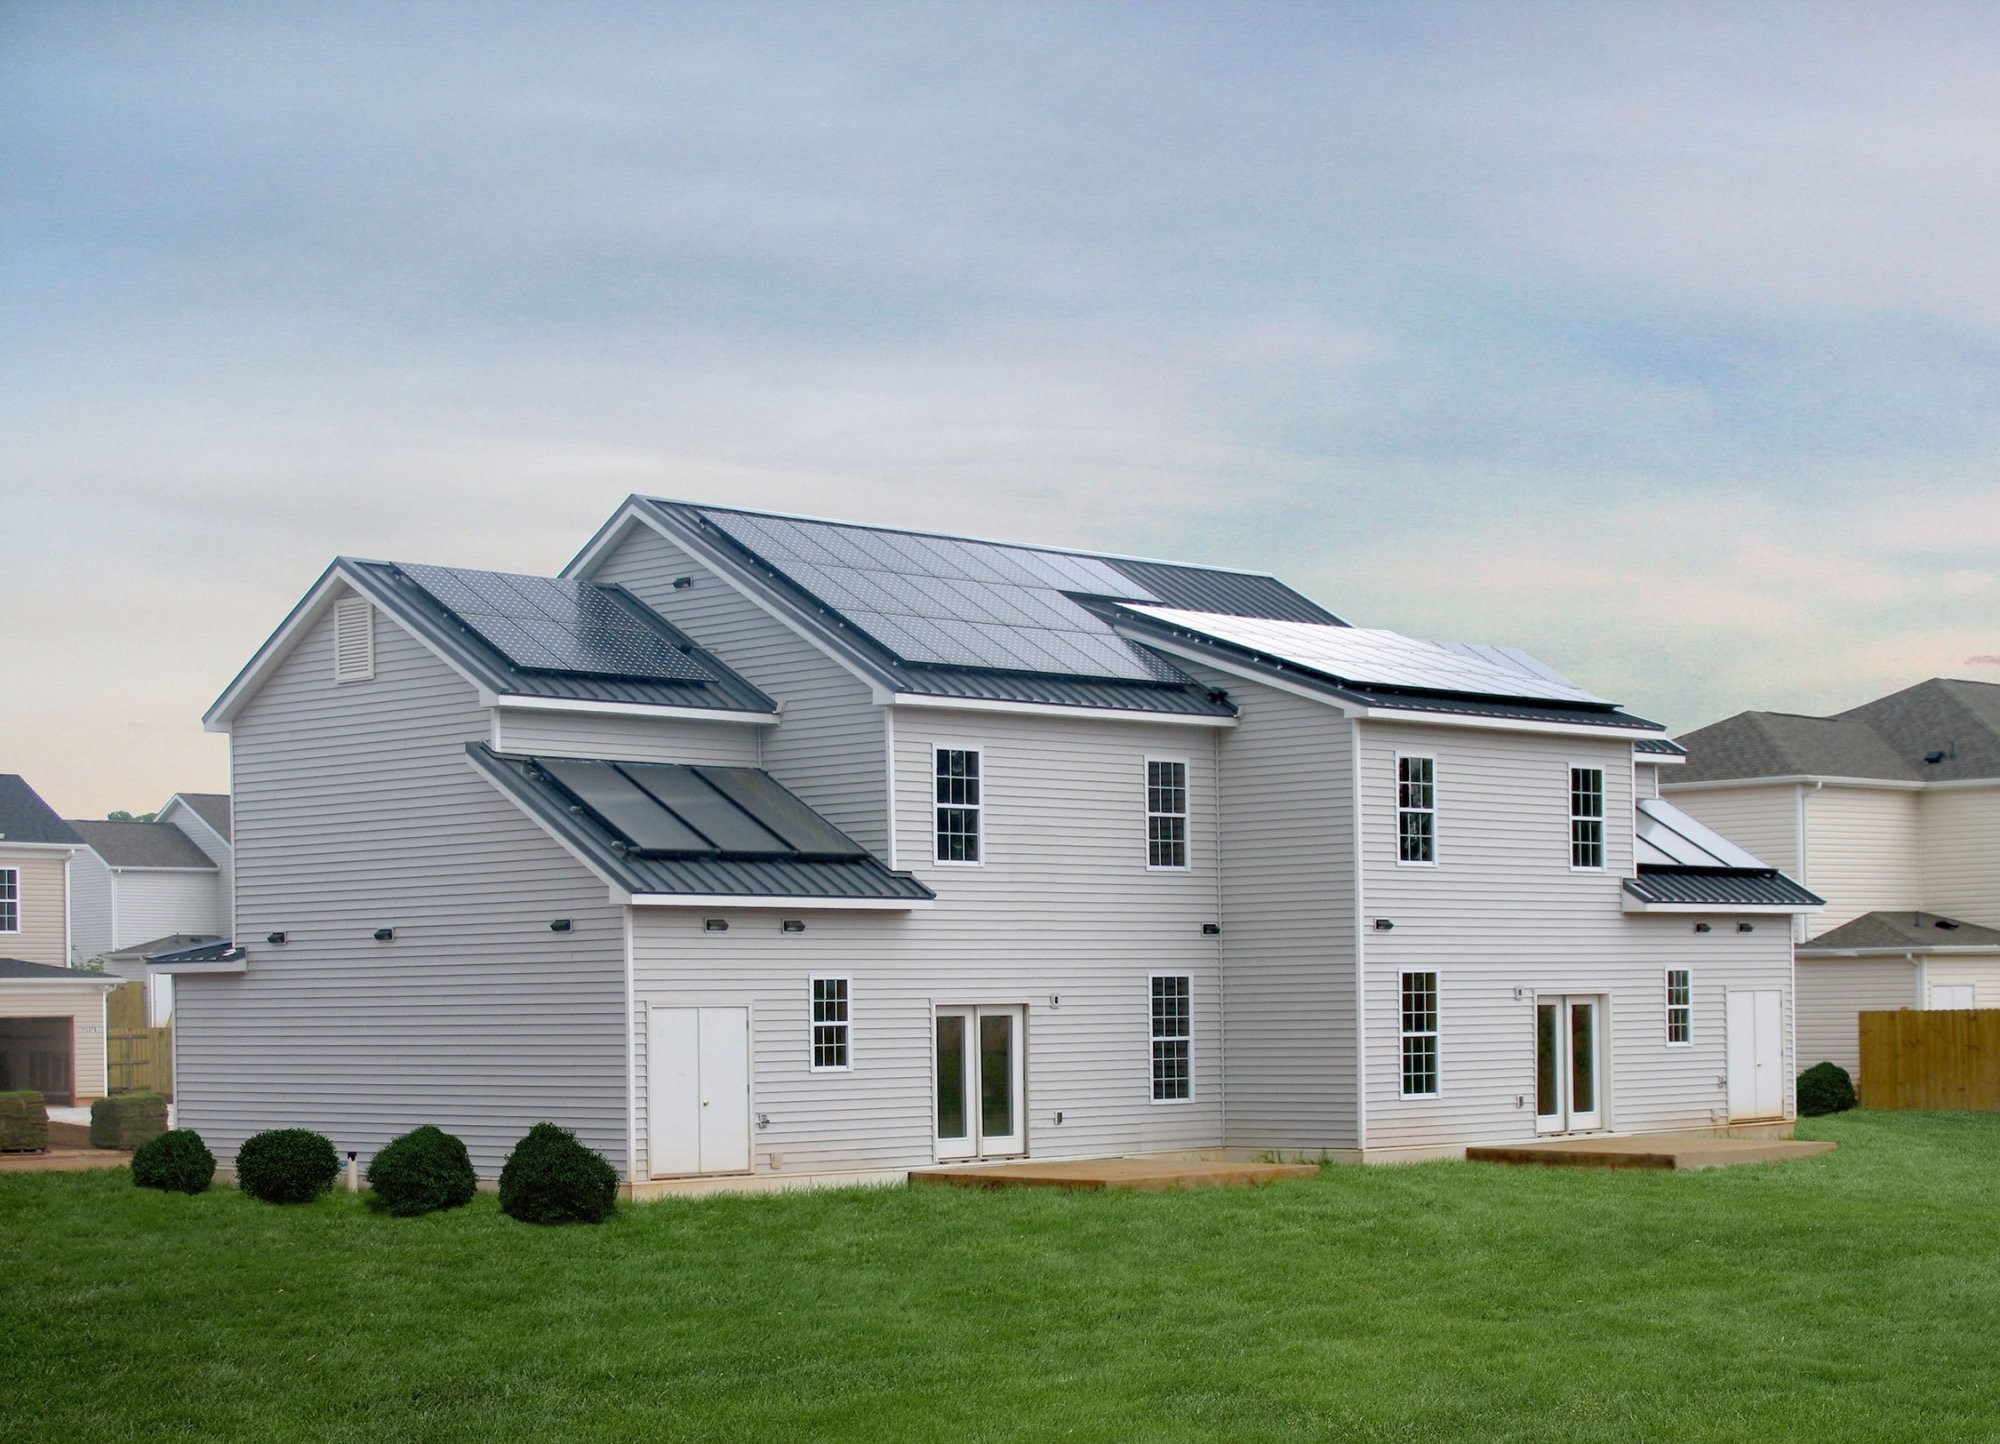 ft-campbell-zero-energy-housing-exterior-backview